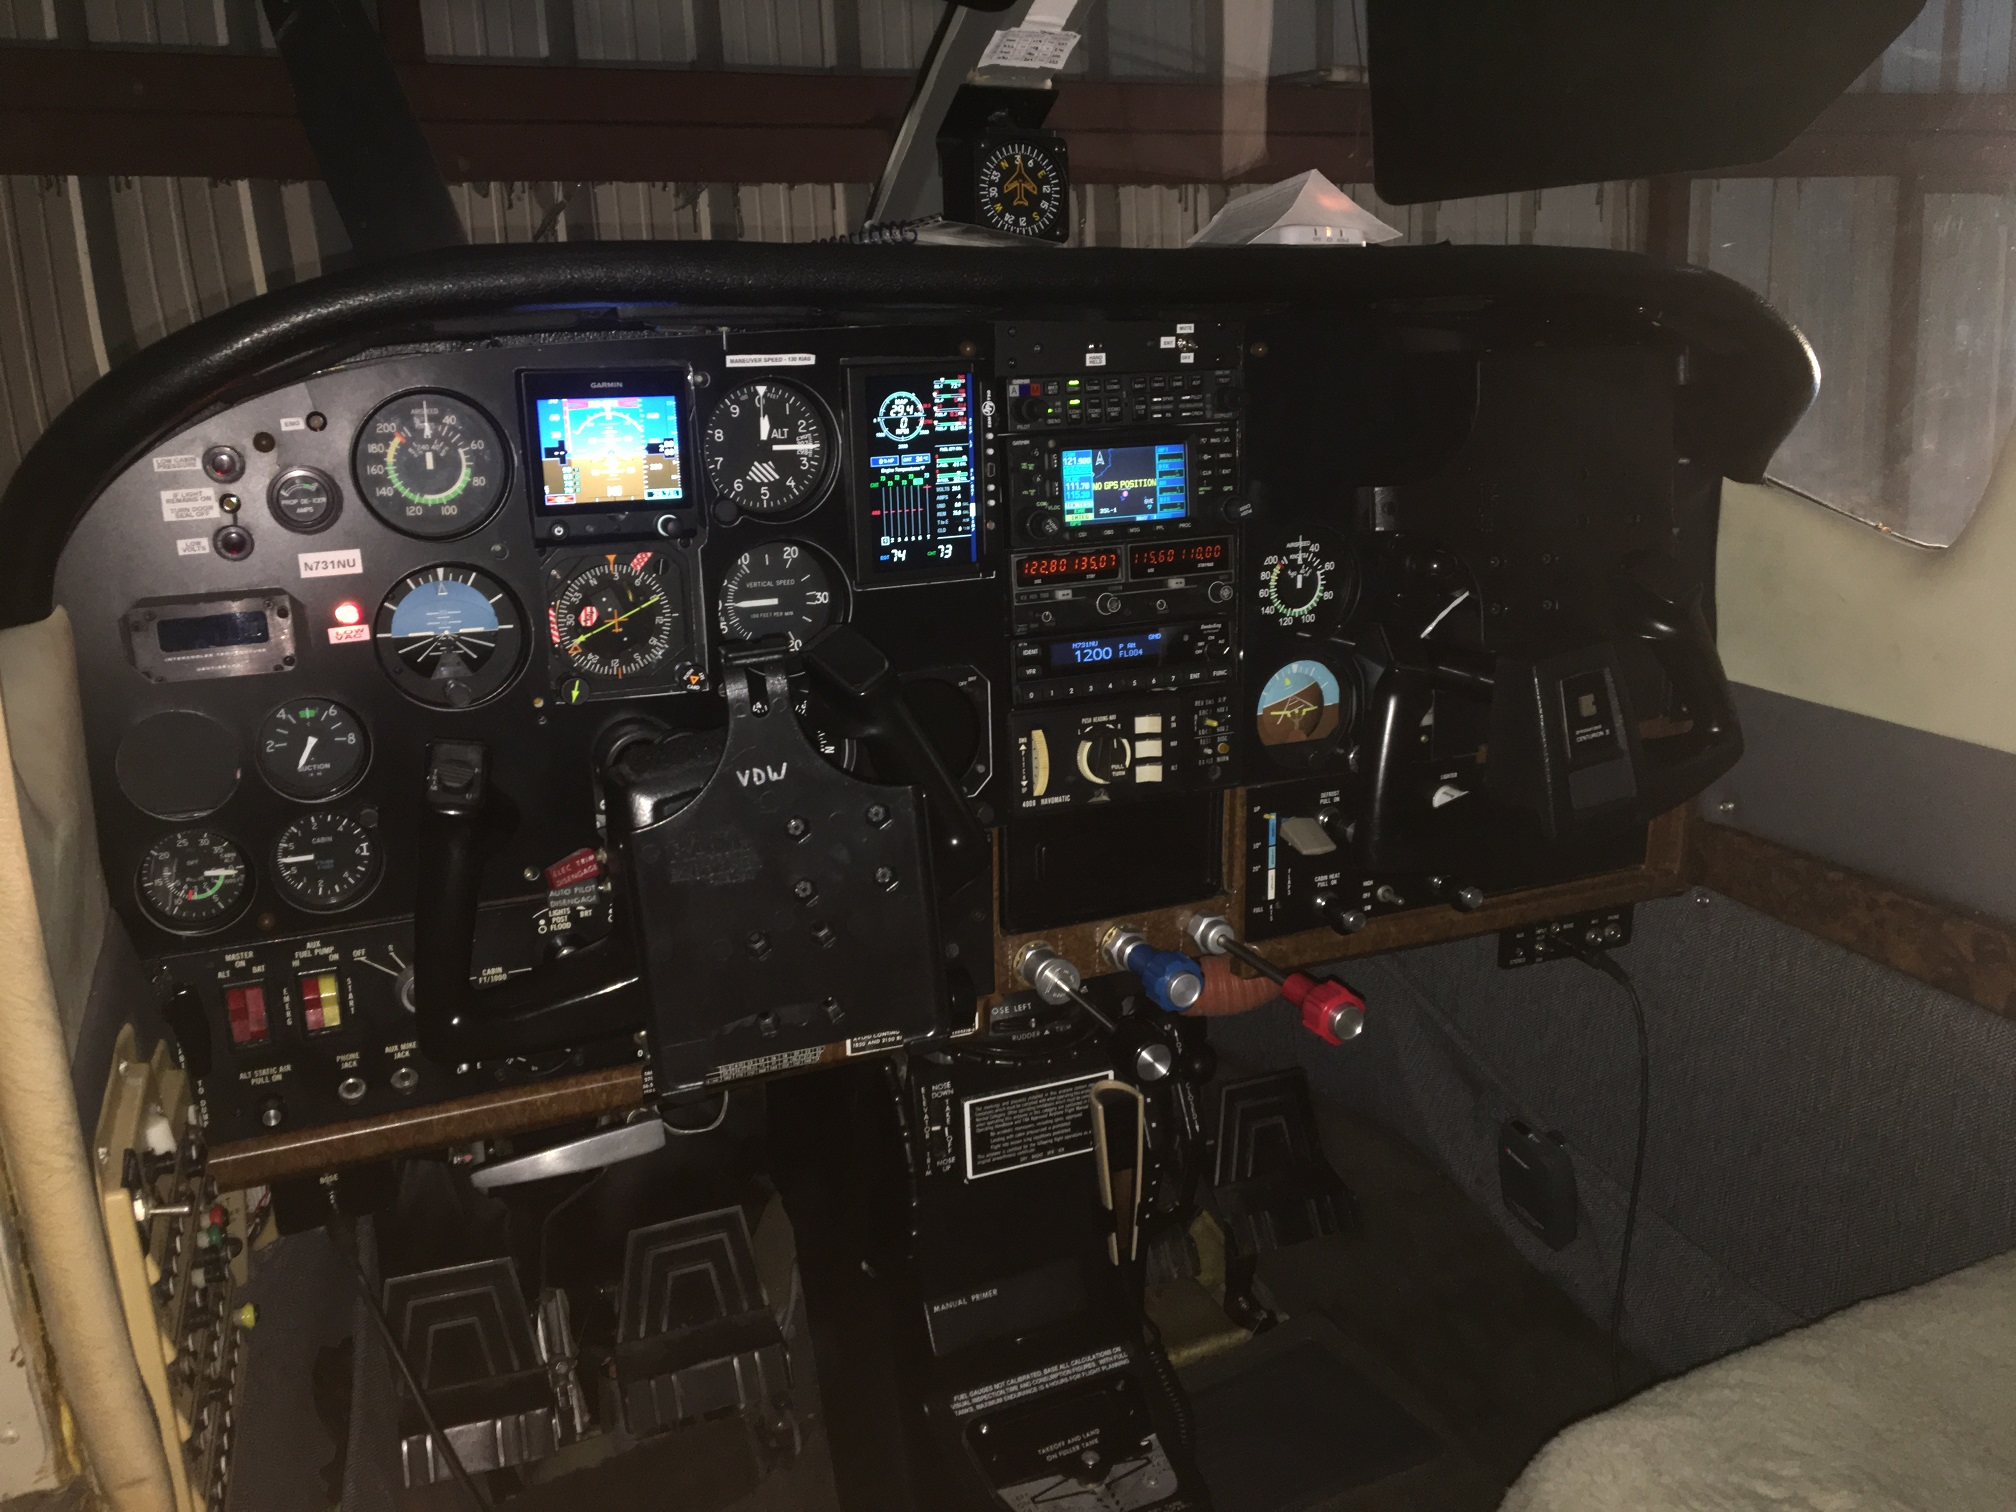 P210 Panel